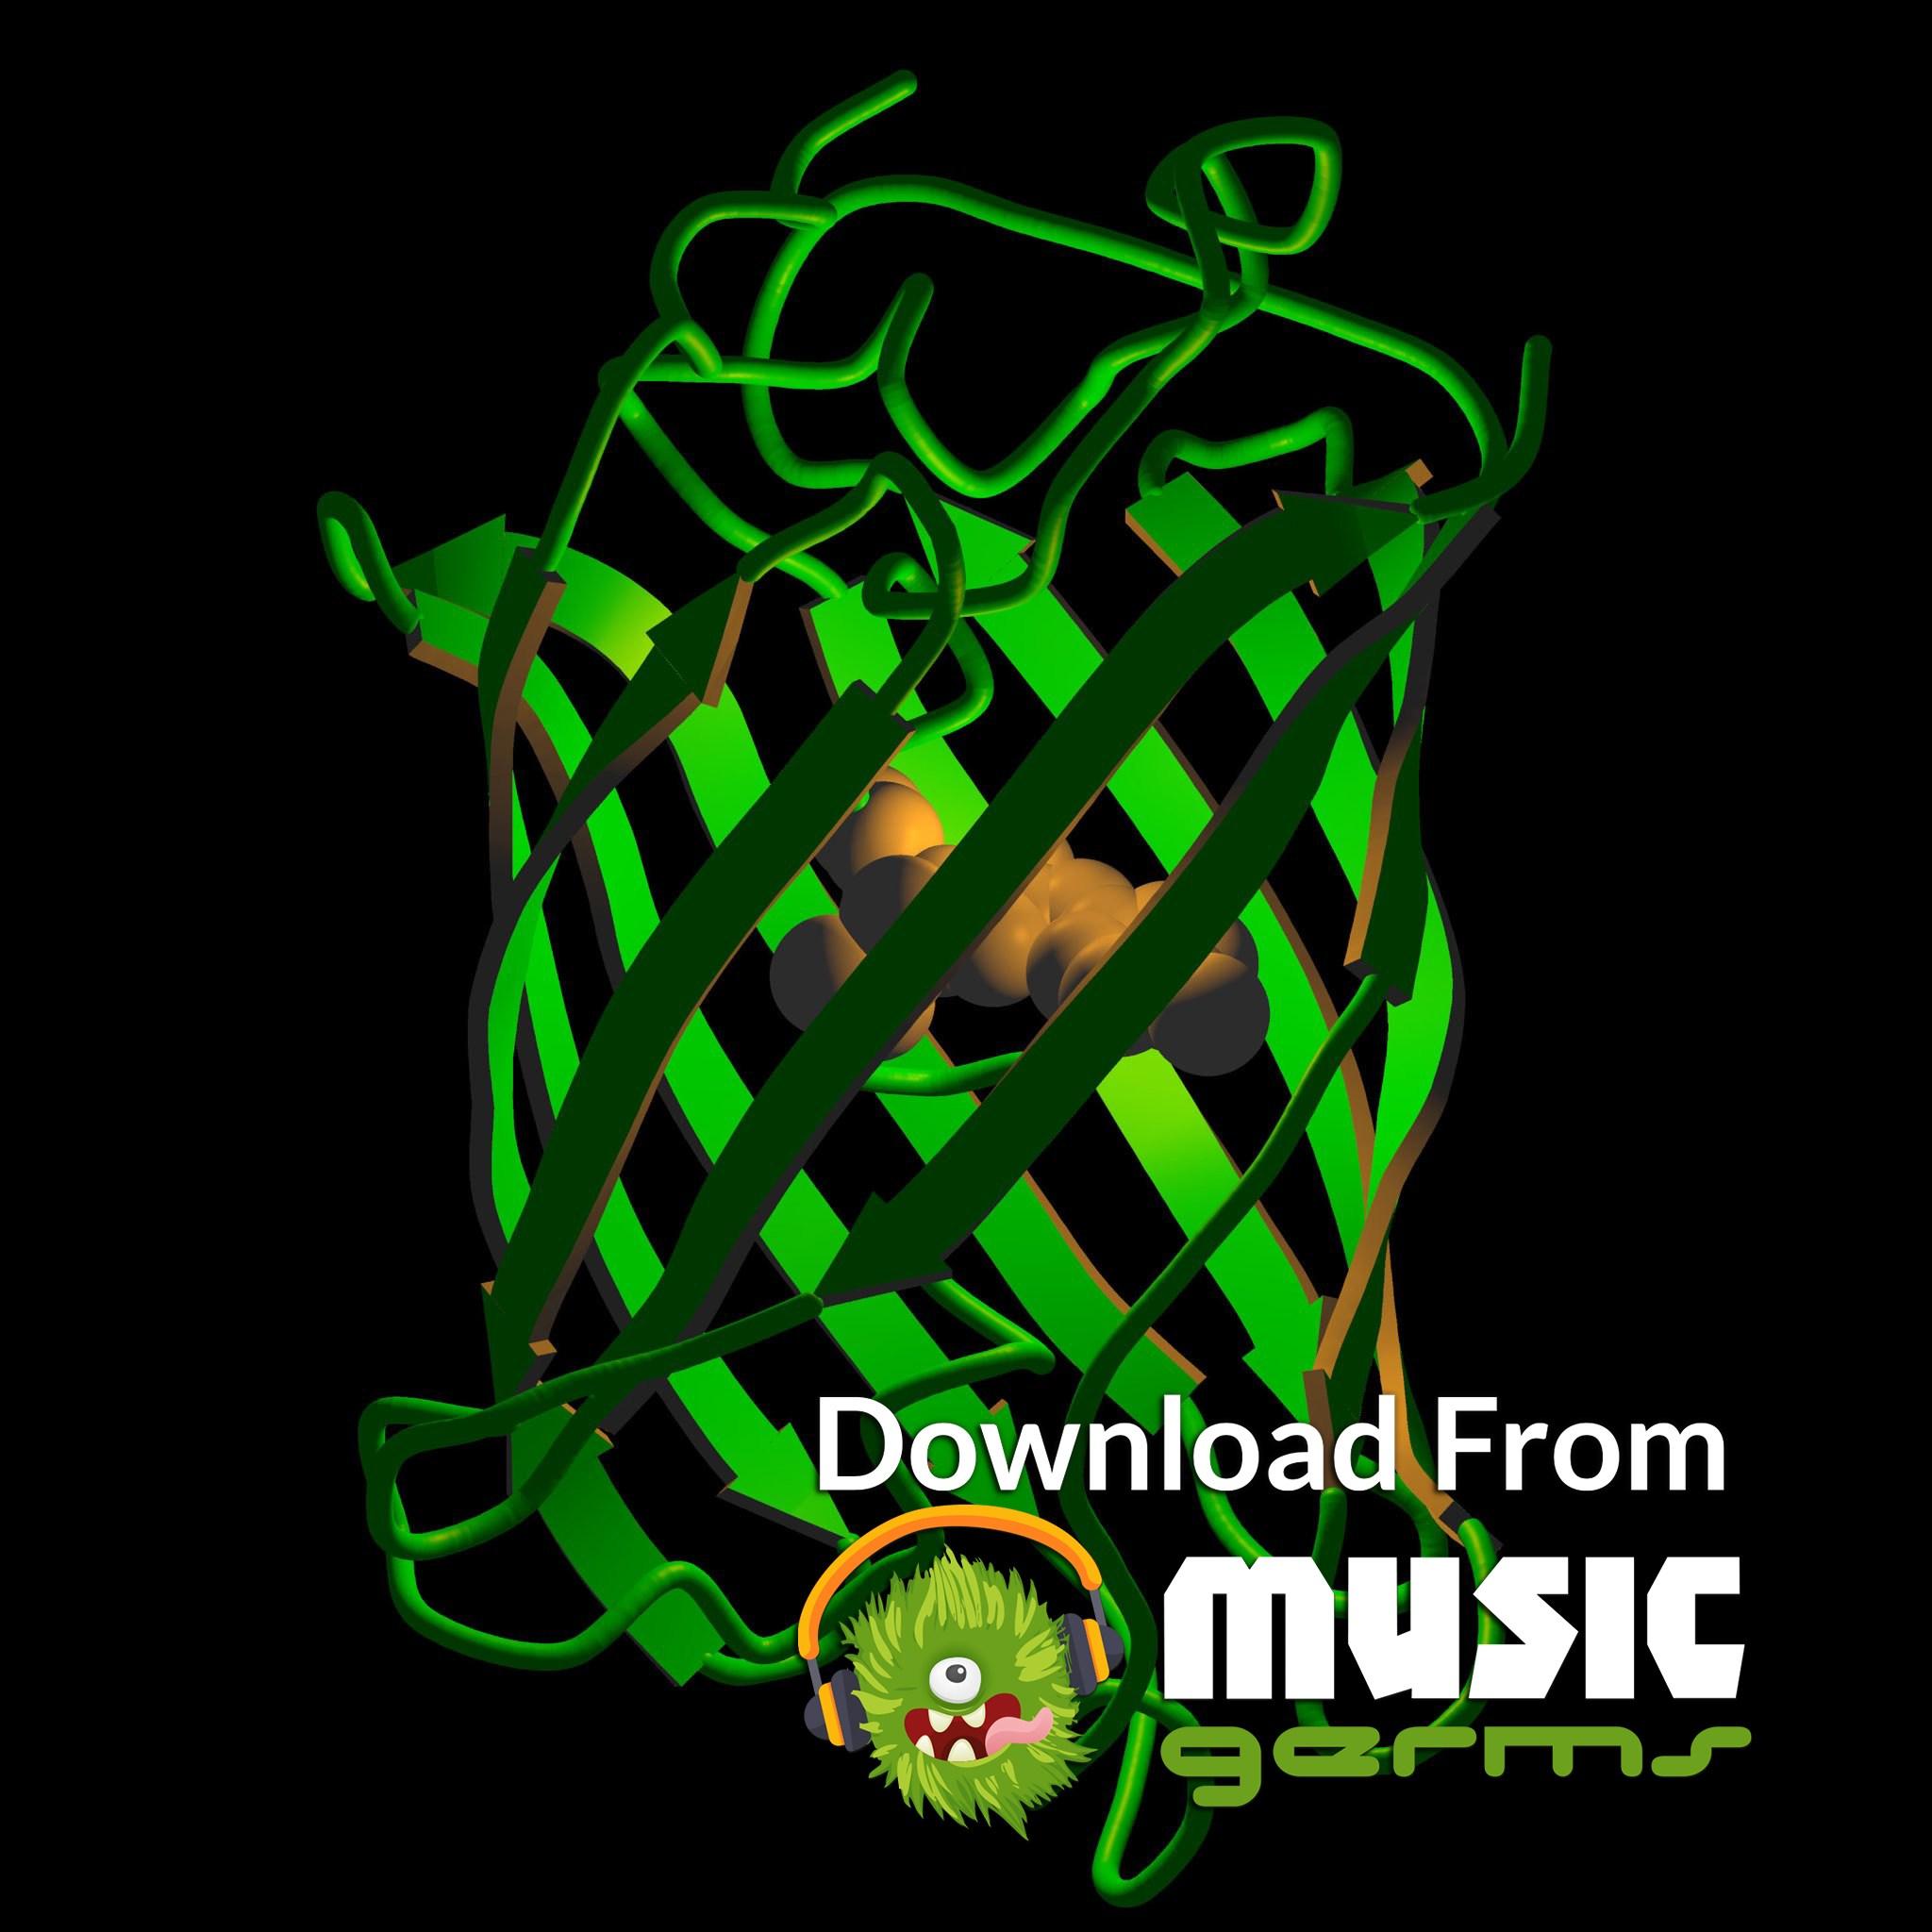 018 Essay On Road Accident Wikipedia Mere Rashke Qamar Arijit Singh Listen Download Mp3 Audio Song Imposing Full